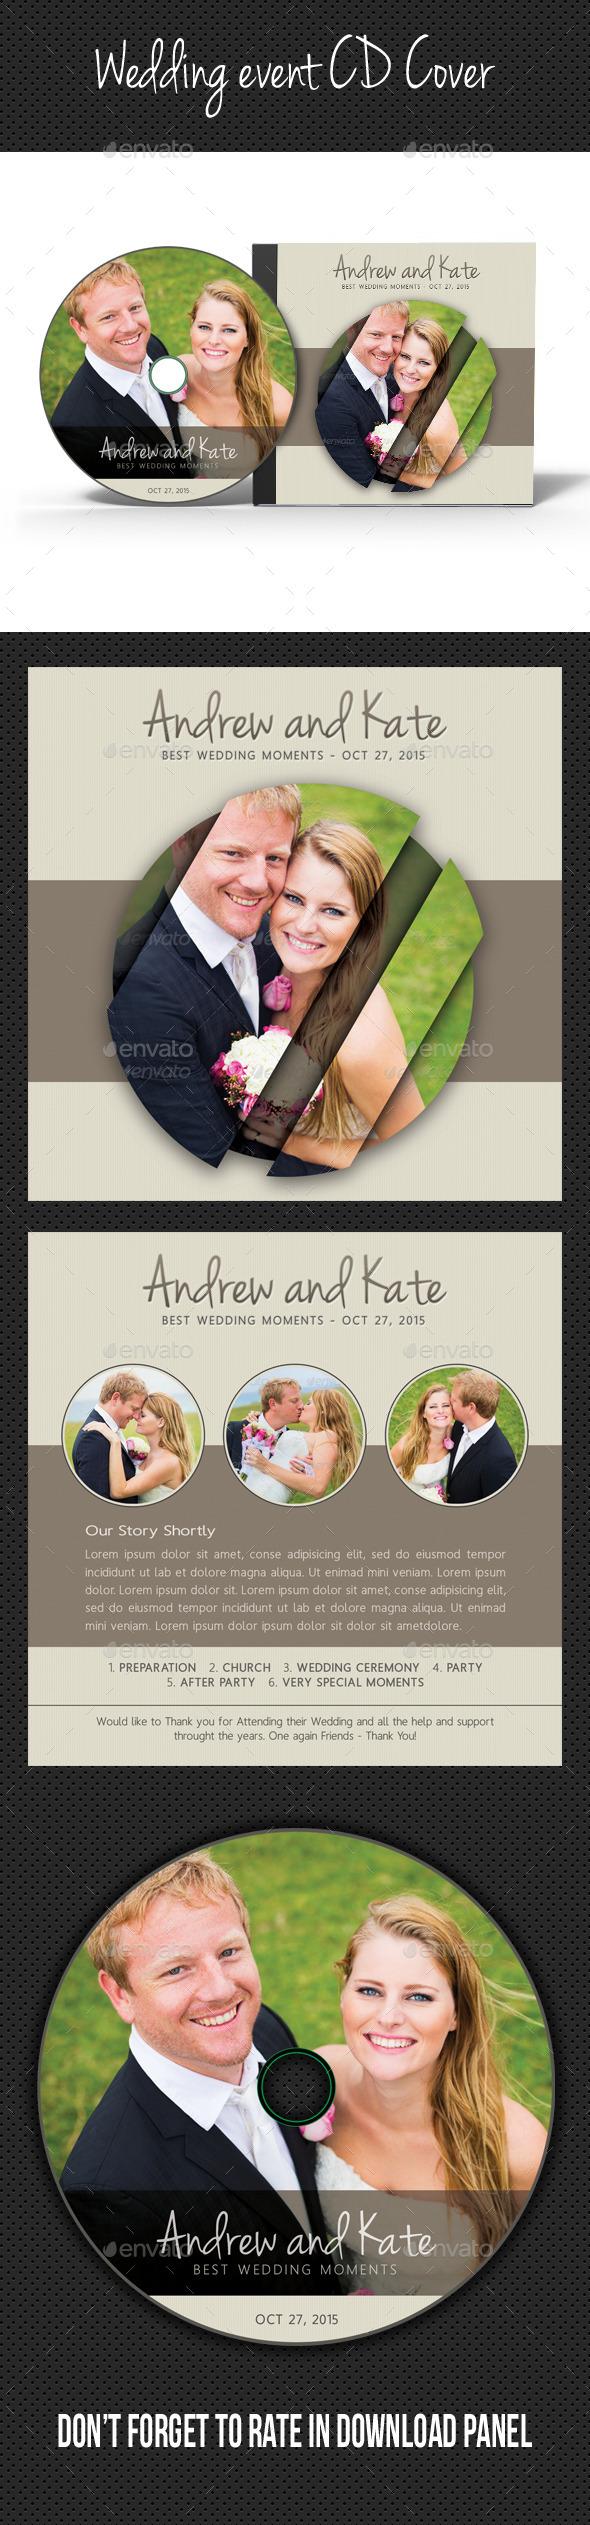 Wedding Event CD Cover V10 - CD & DVD Artwork Print Templates